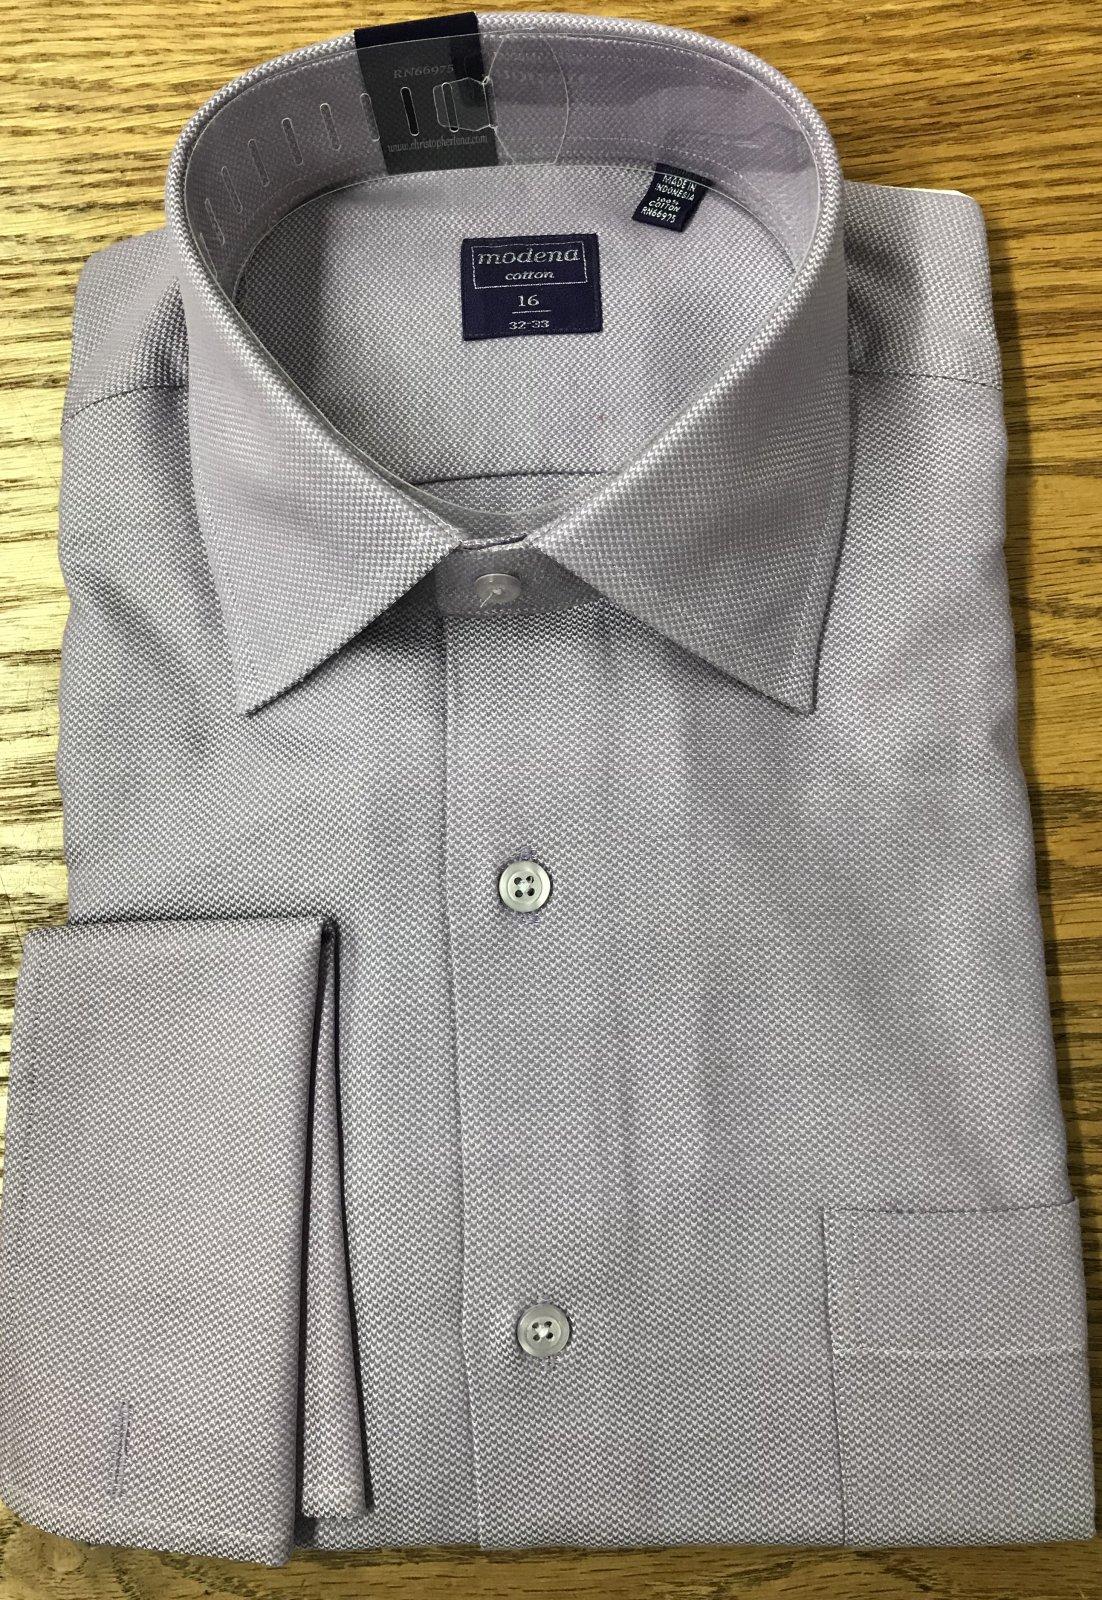 Modena Lavender French Cuff Shirt